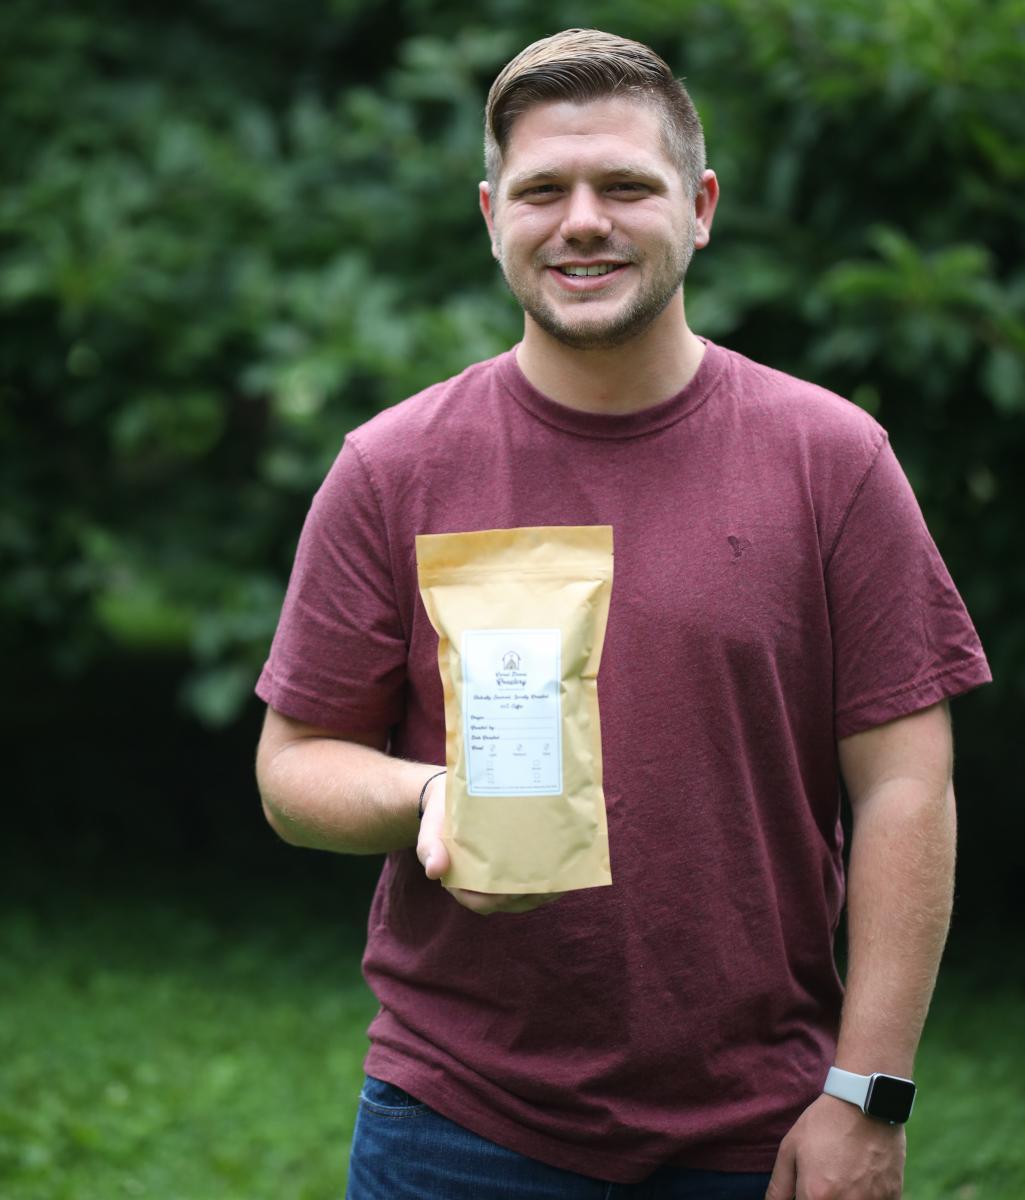 Kameron holding a bag of coffee.